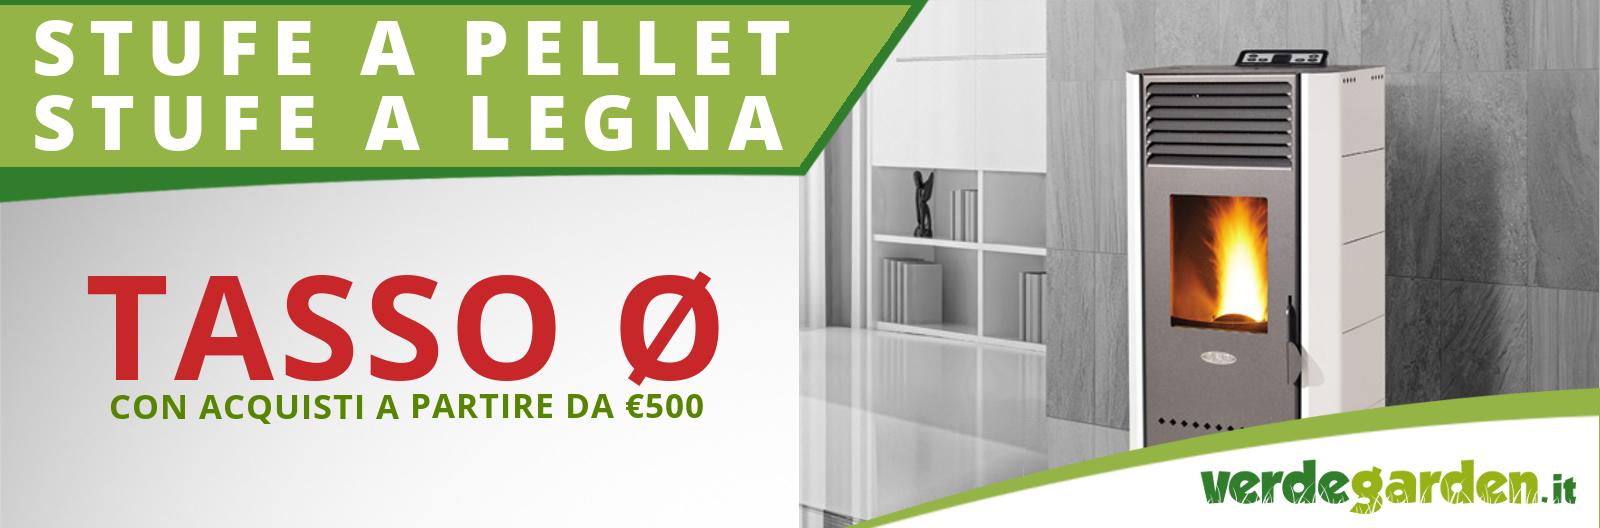 Offerte stufe in vendita su verdegarden - Stufe a legna occasione ...